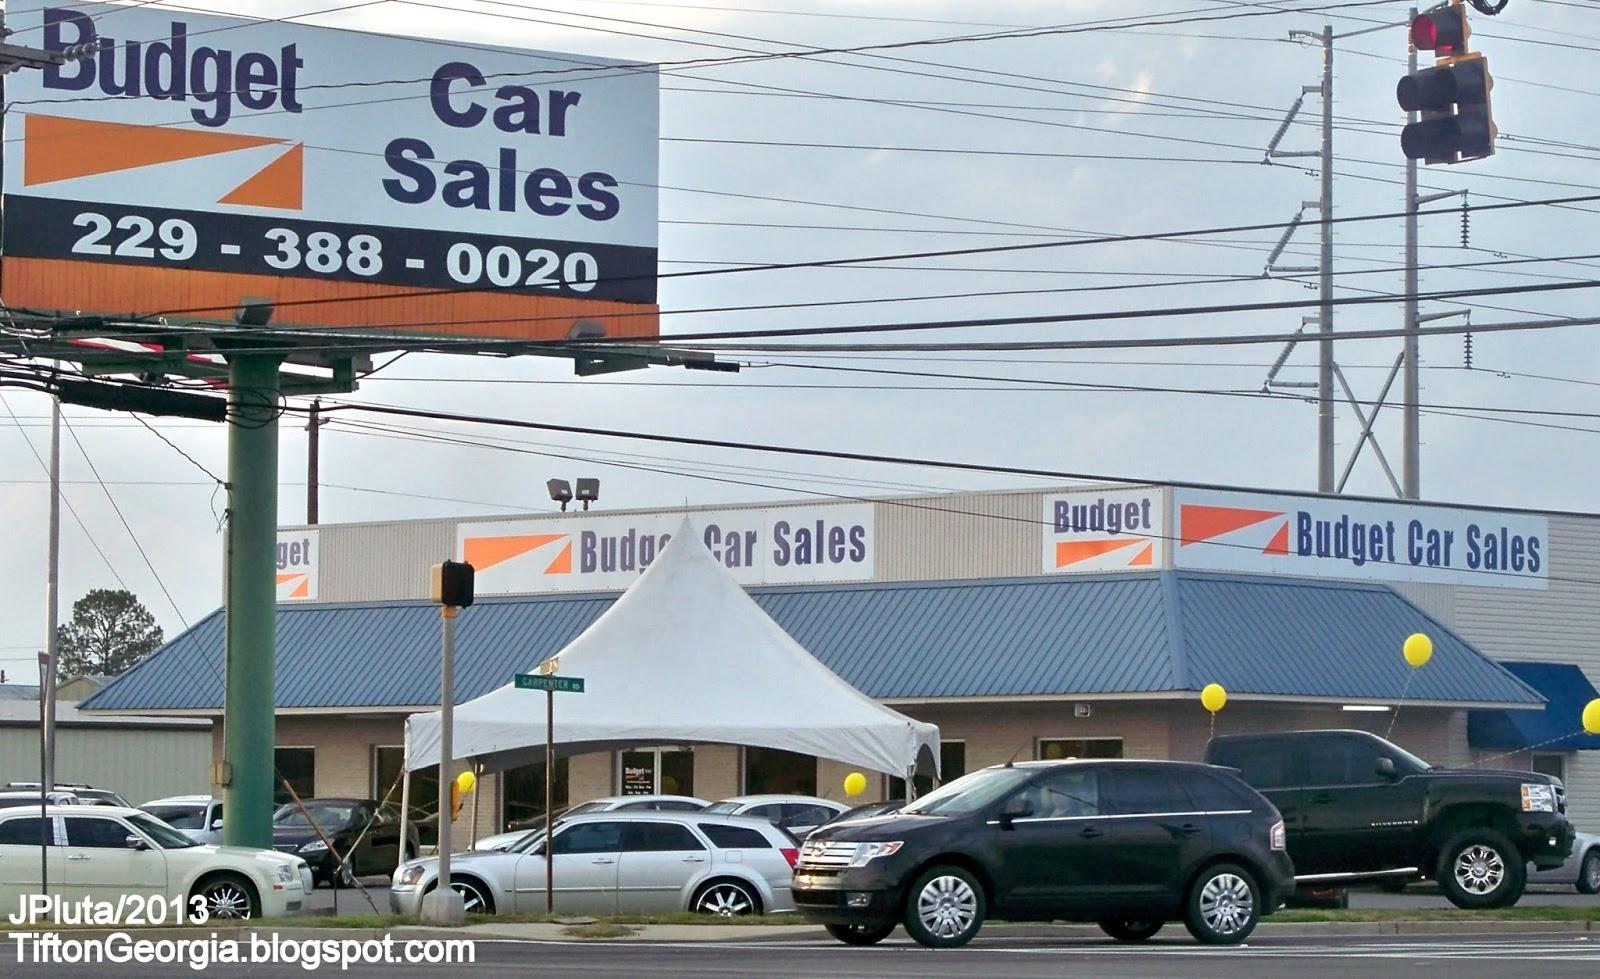 Budget Rental Car Sales >> Tifton Georgia Tift College Attorney Restaurant Bank